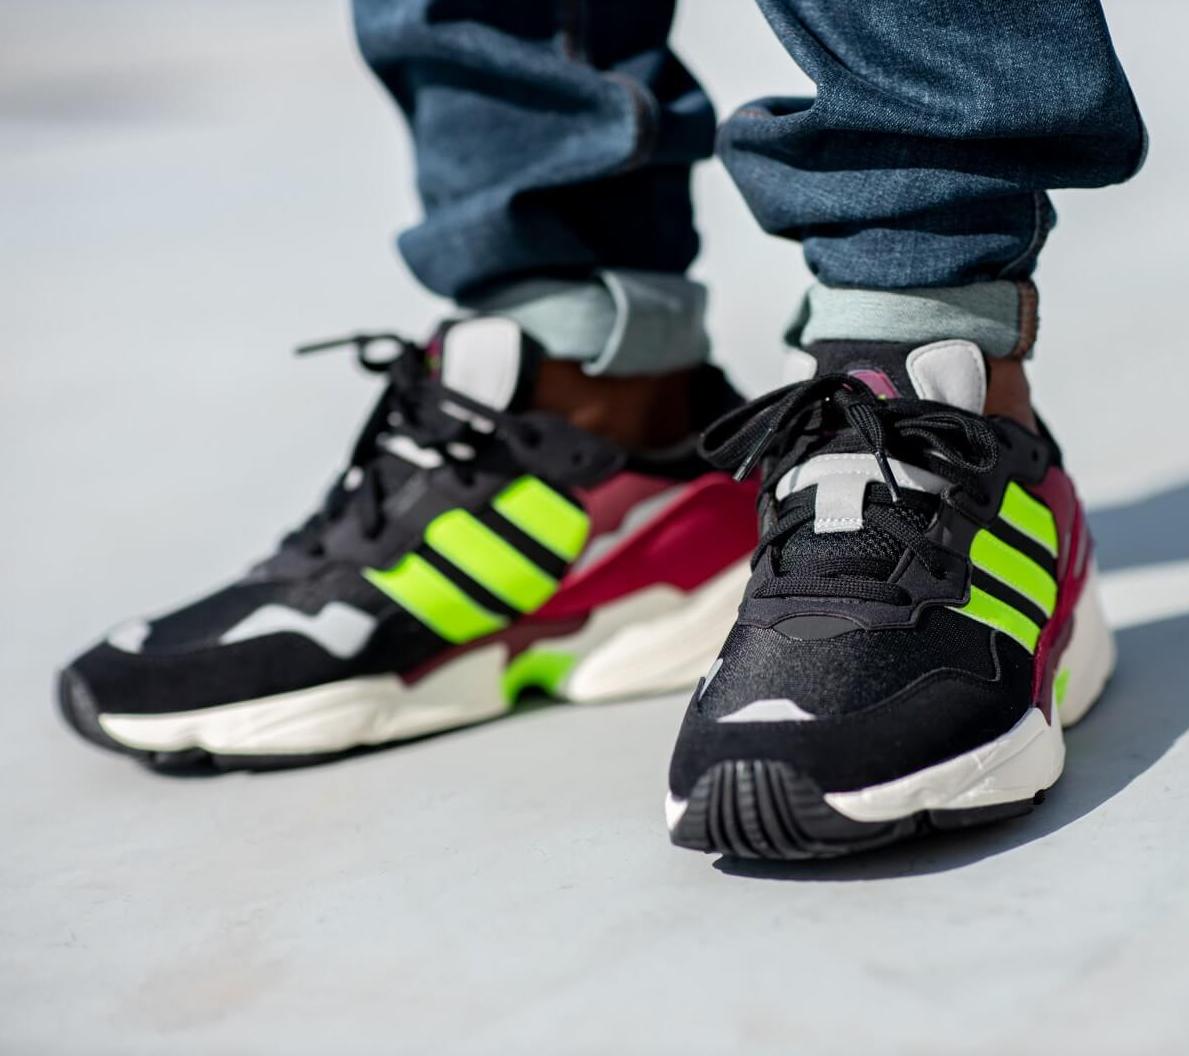 adidas-yung-96-blackburgundy-volt-4-1600.png